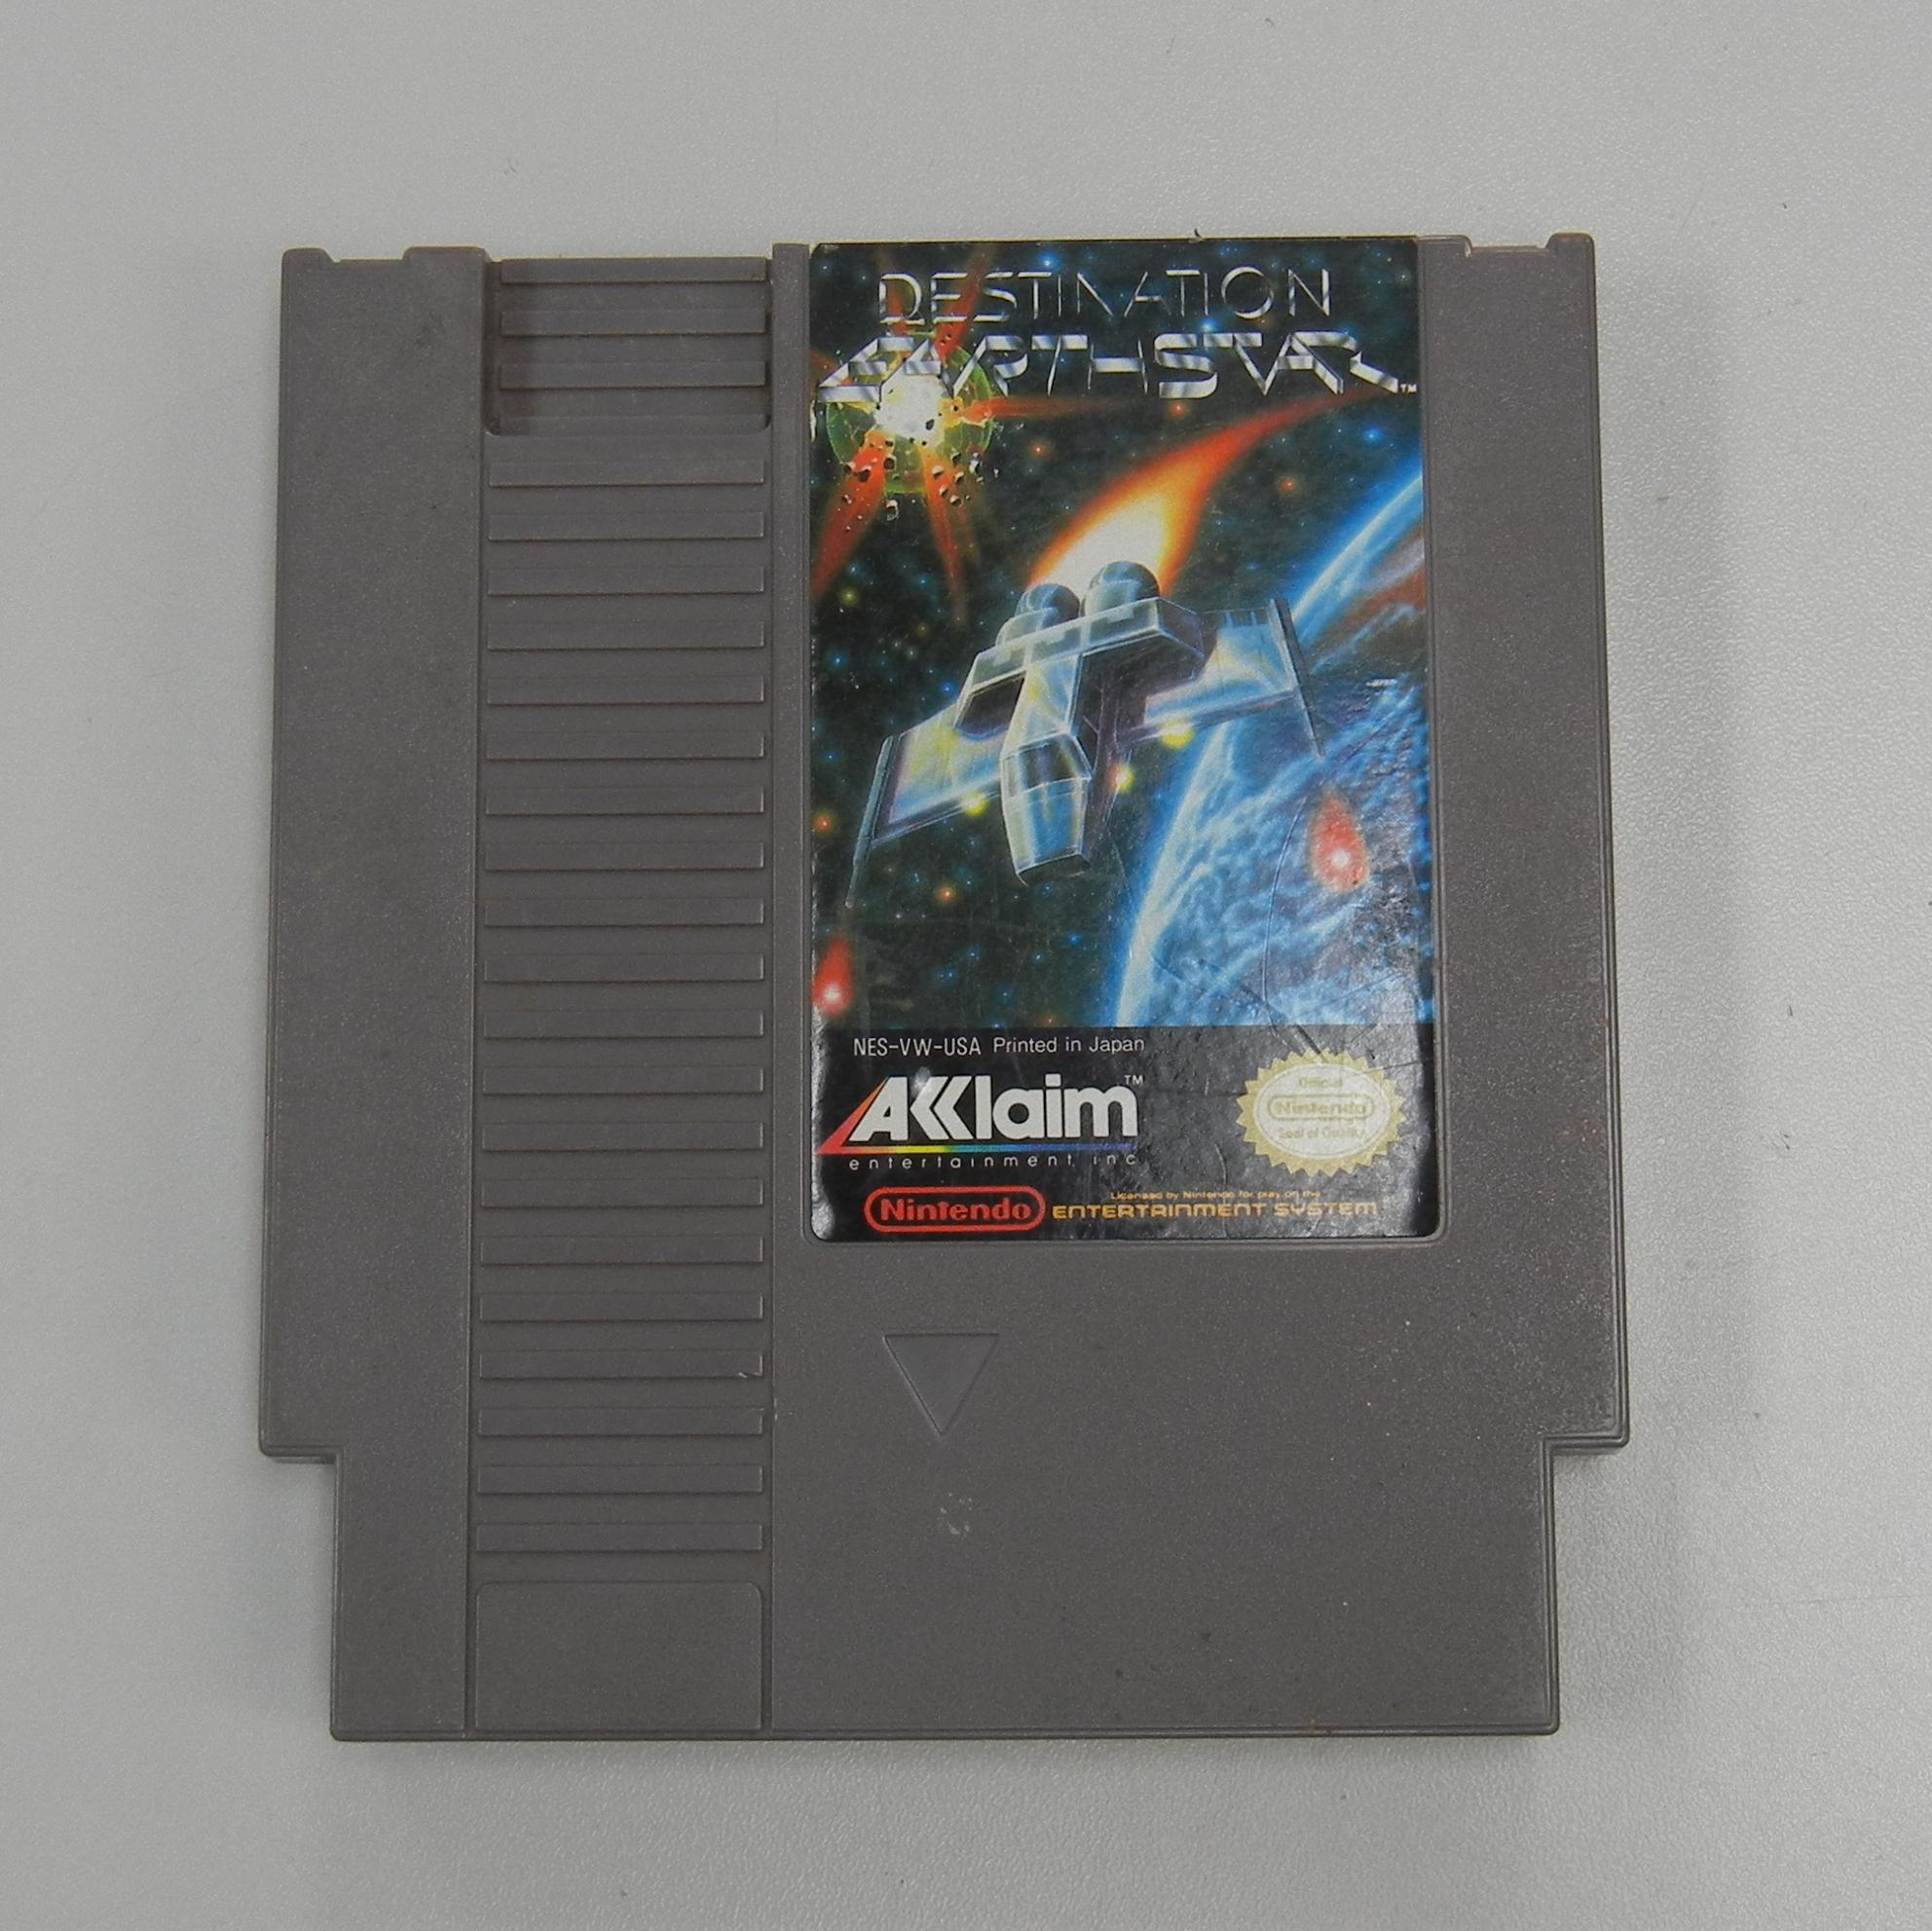 DESTINATION EARTH STAR NES GAME